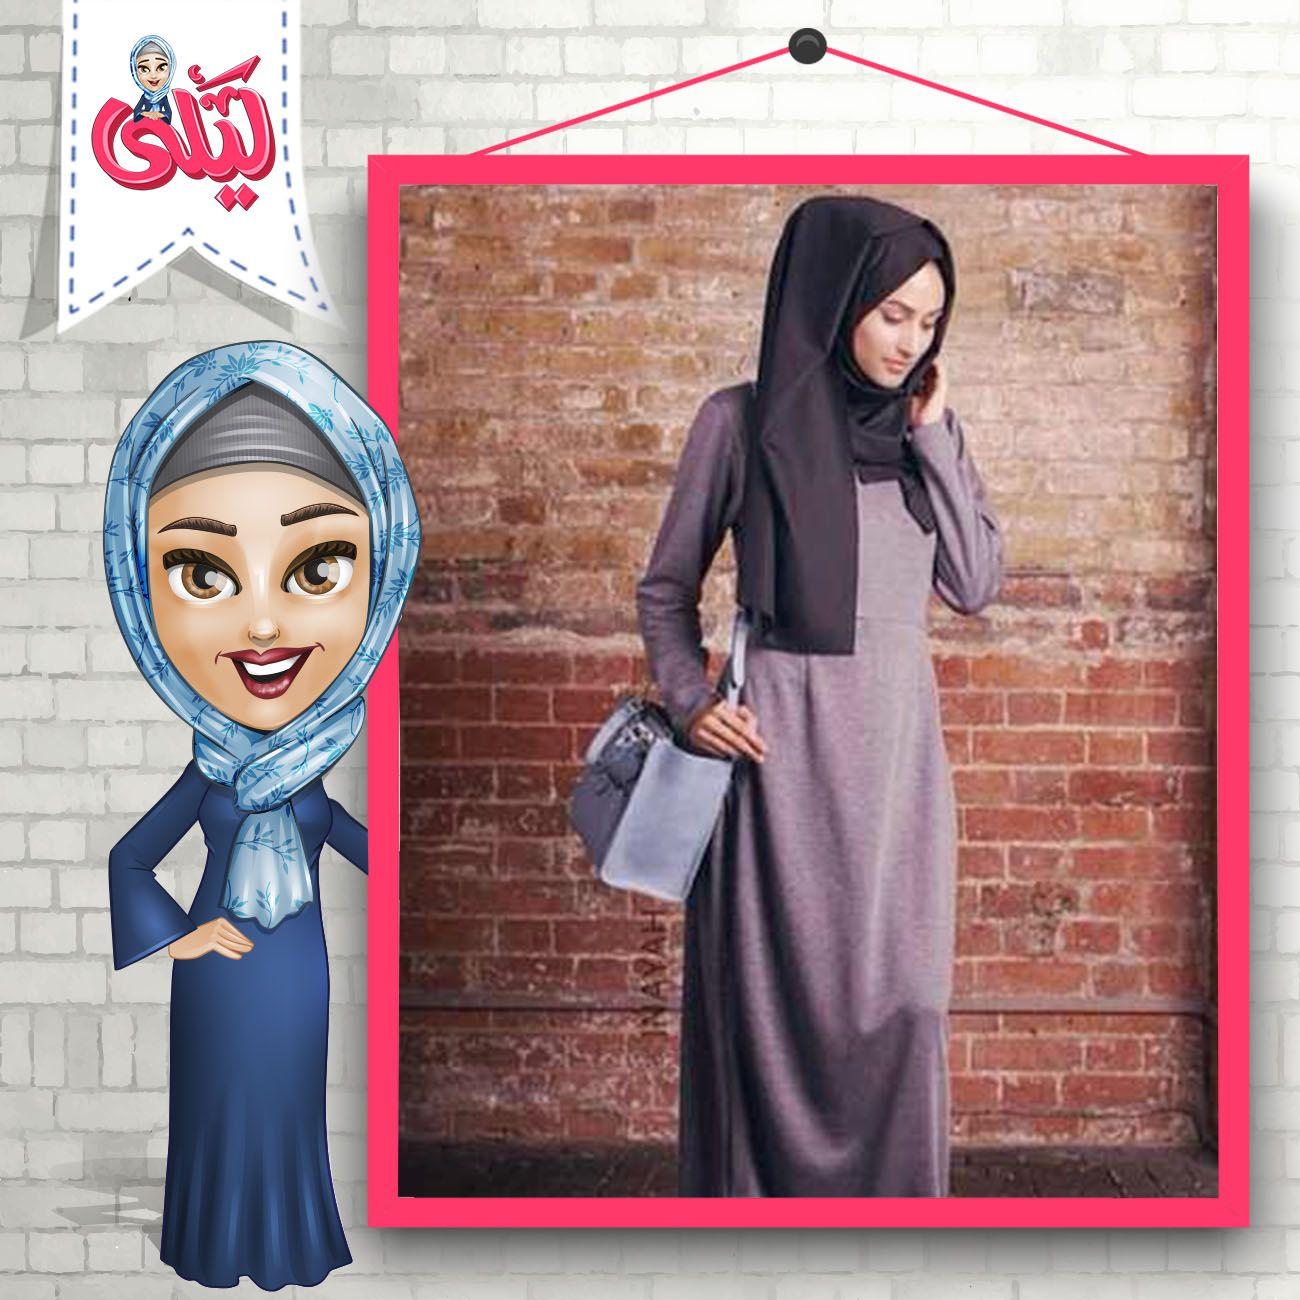 8cab92b1ba197 ملابس محجبات كاجوال هي أكثر ما يناسب المرأة في أوقات العمل